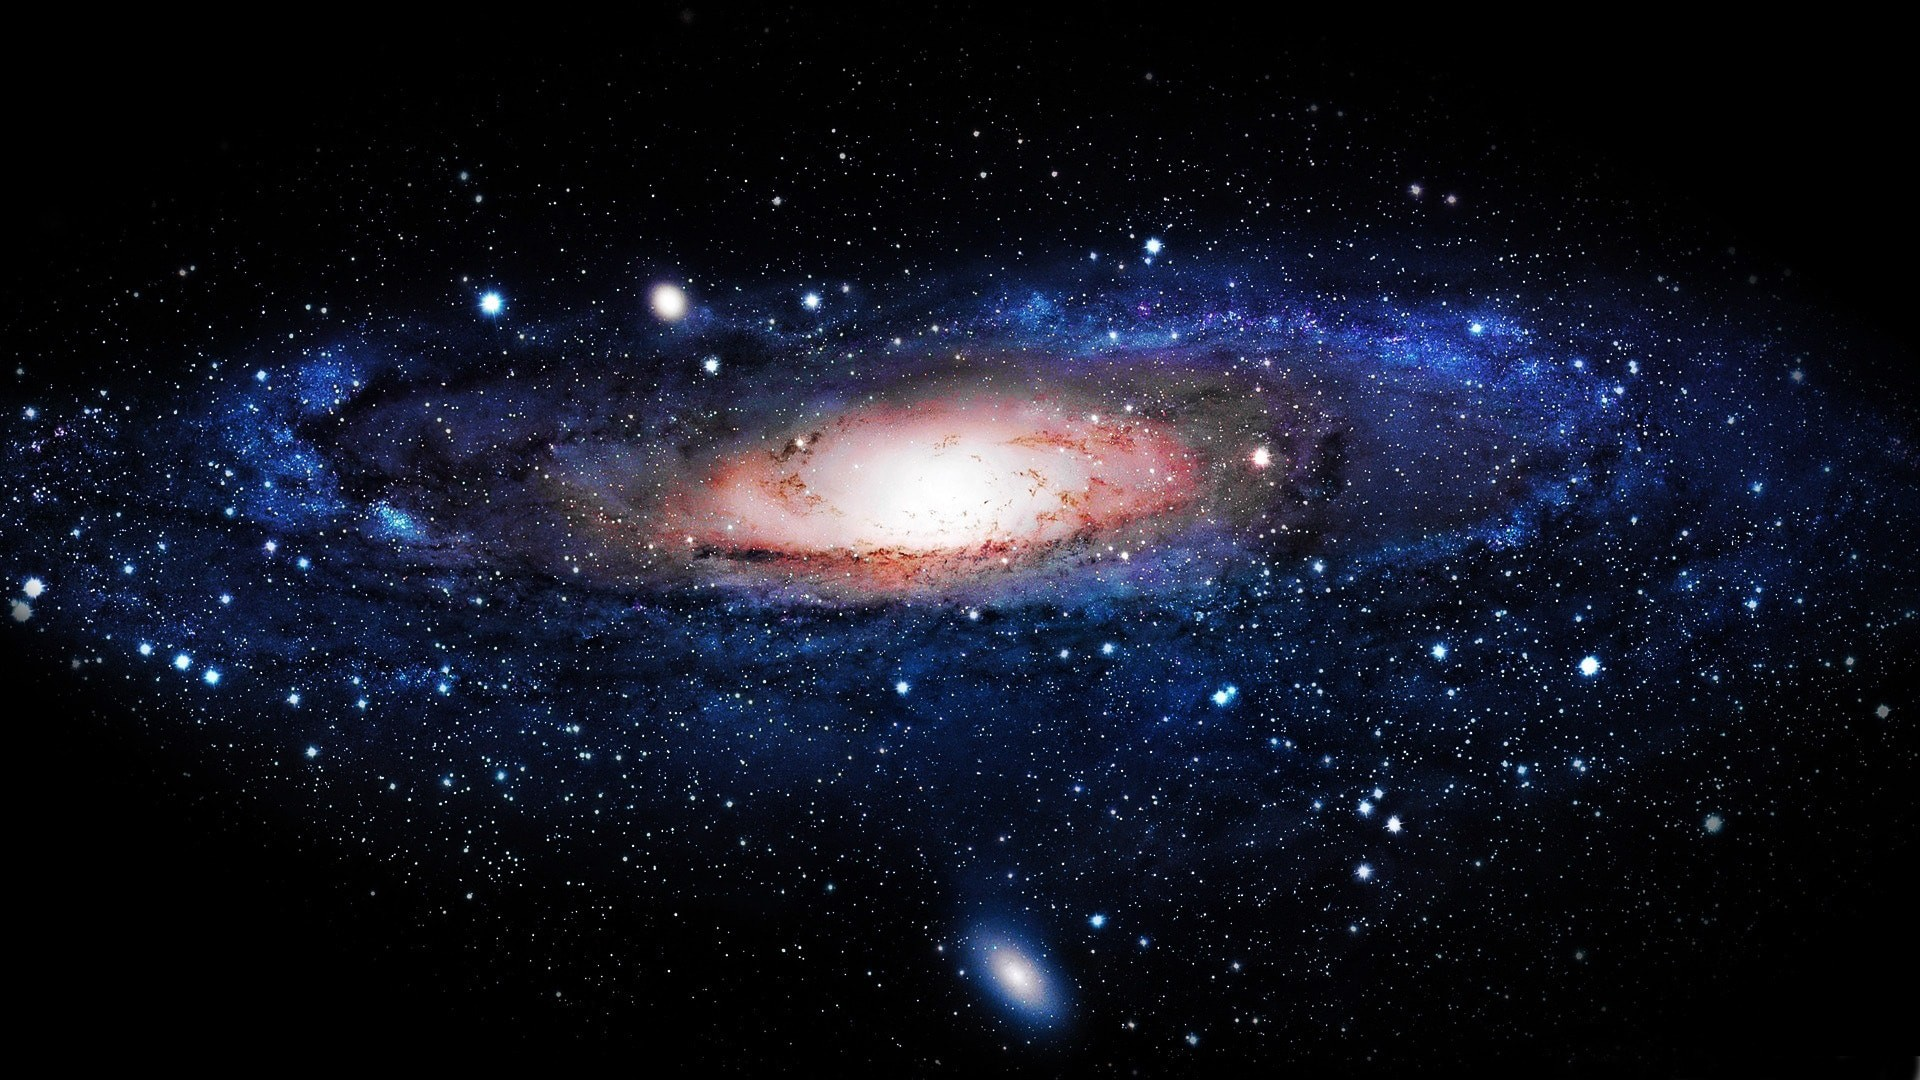 Milky Way HD pics Milky Way Wallpapers hd